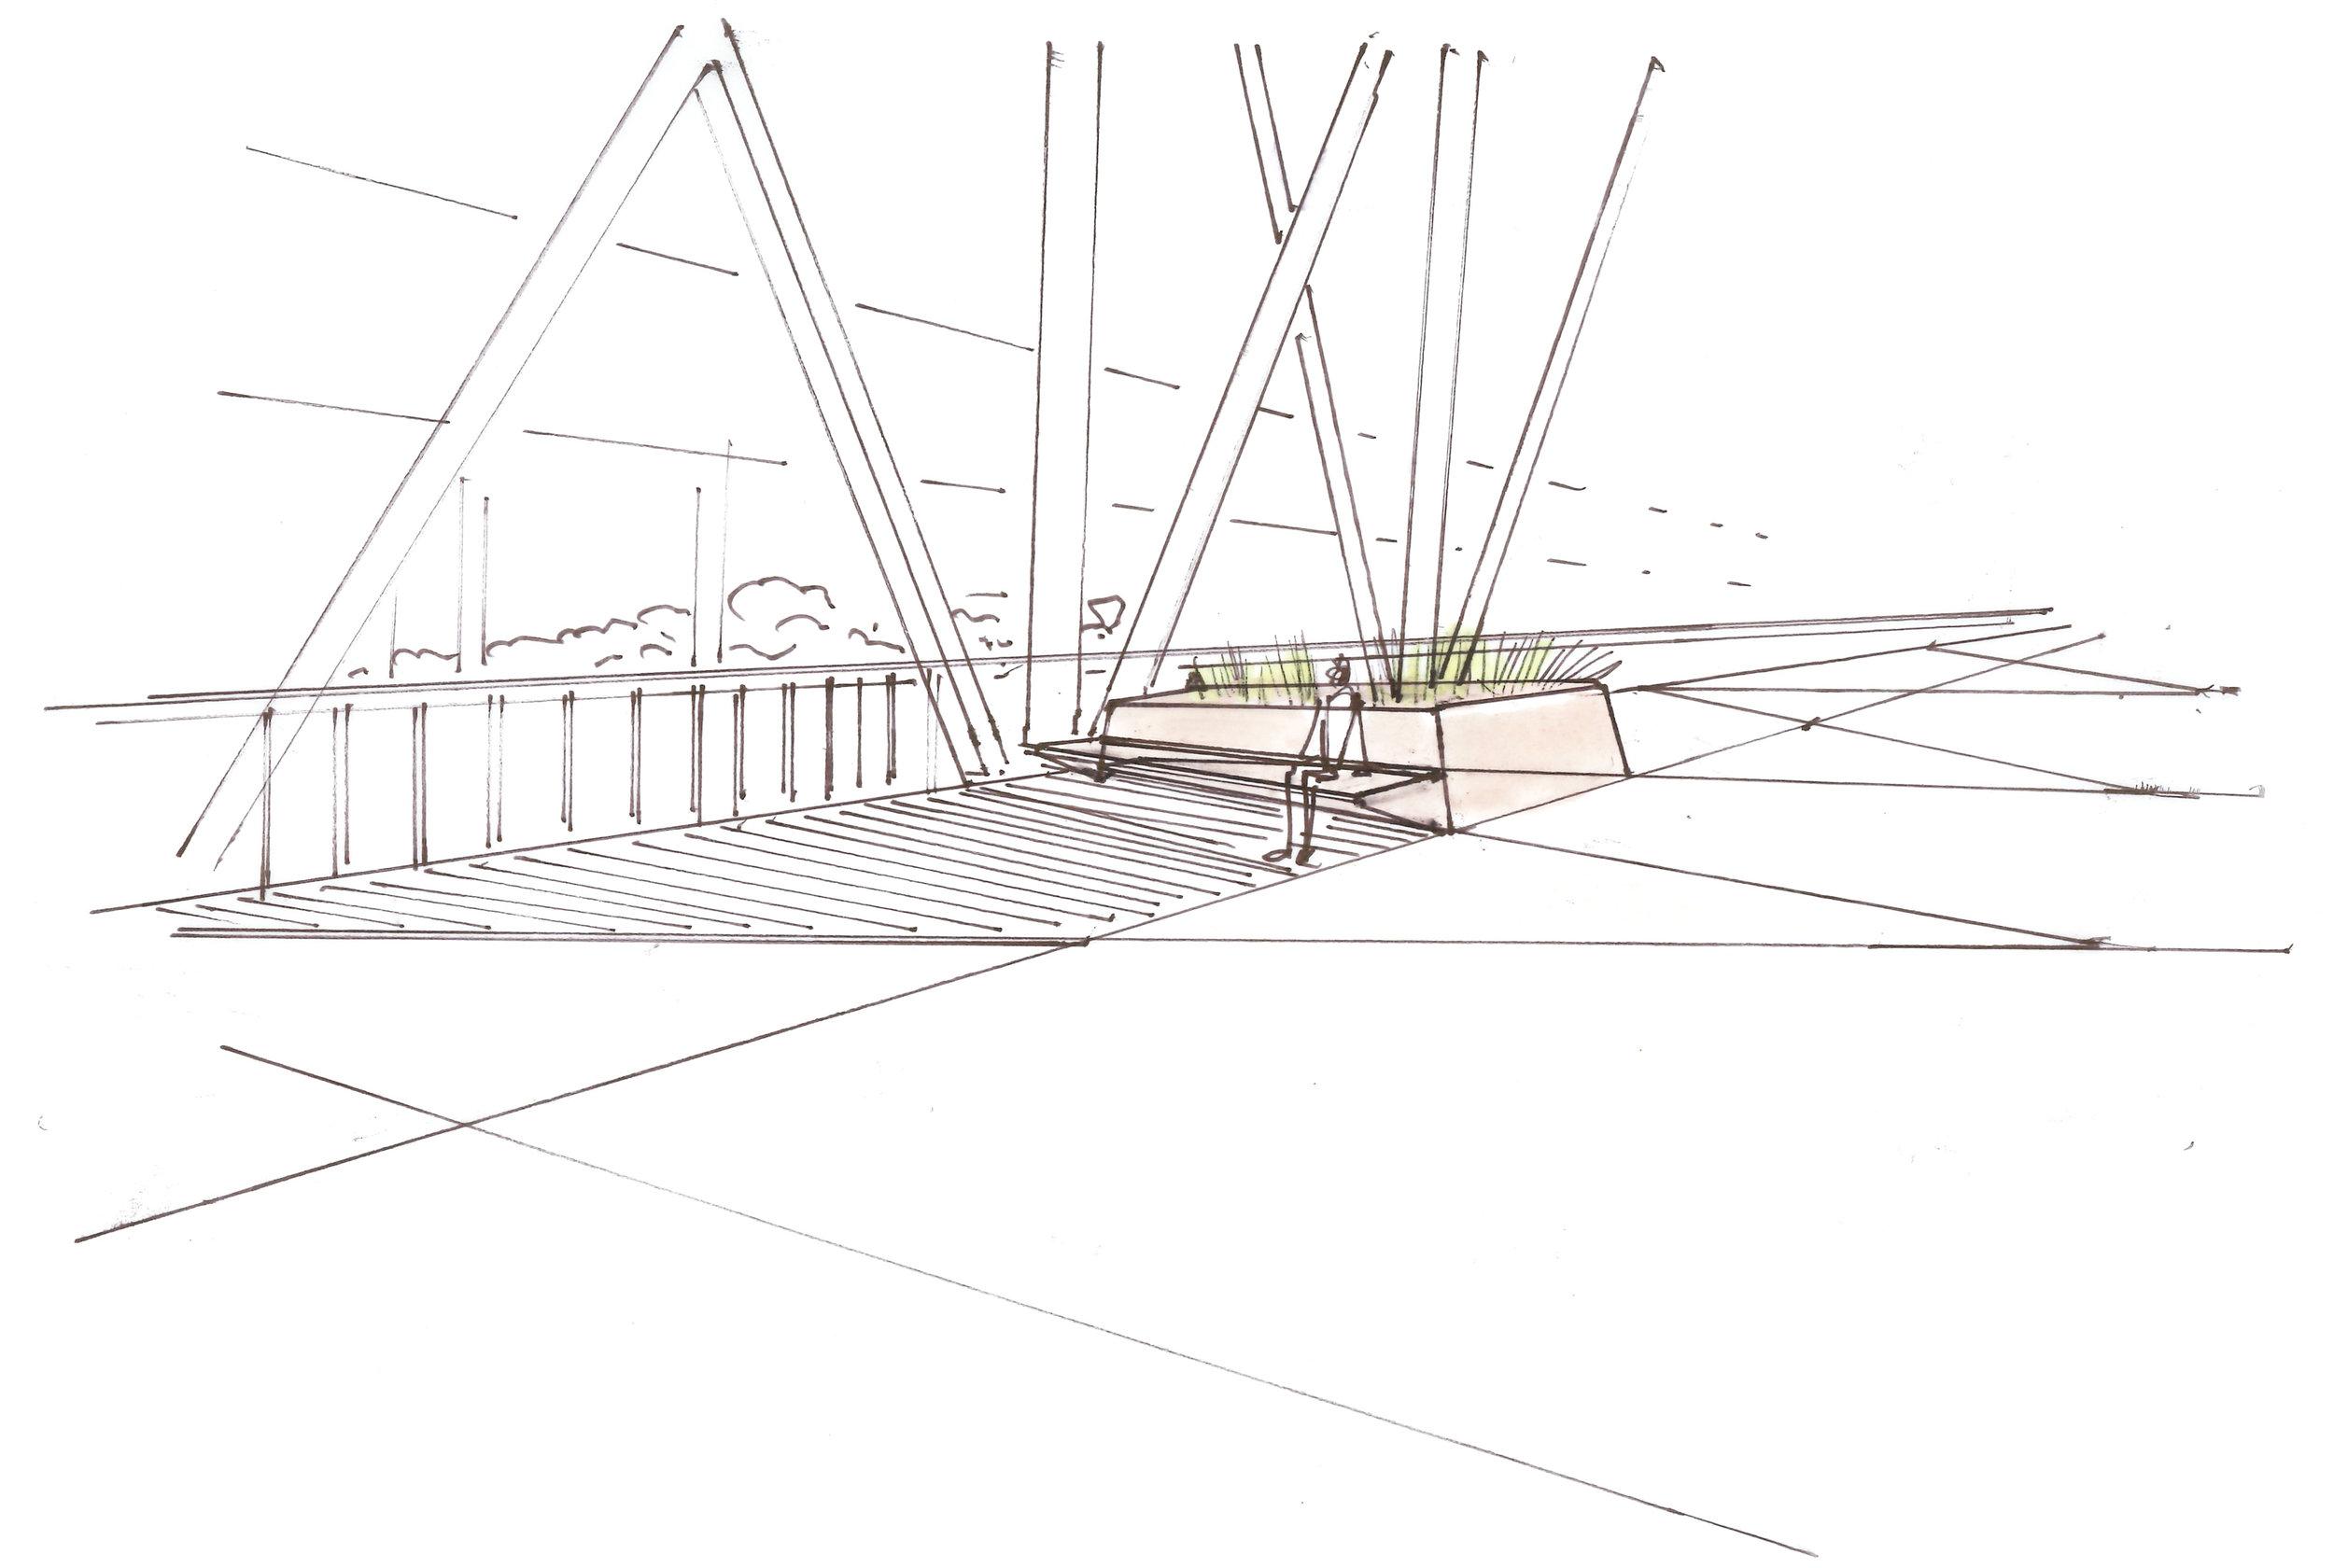 BRIDGE_PERSPECTIVE SKETCH.jpg